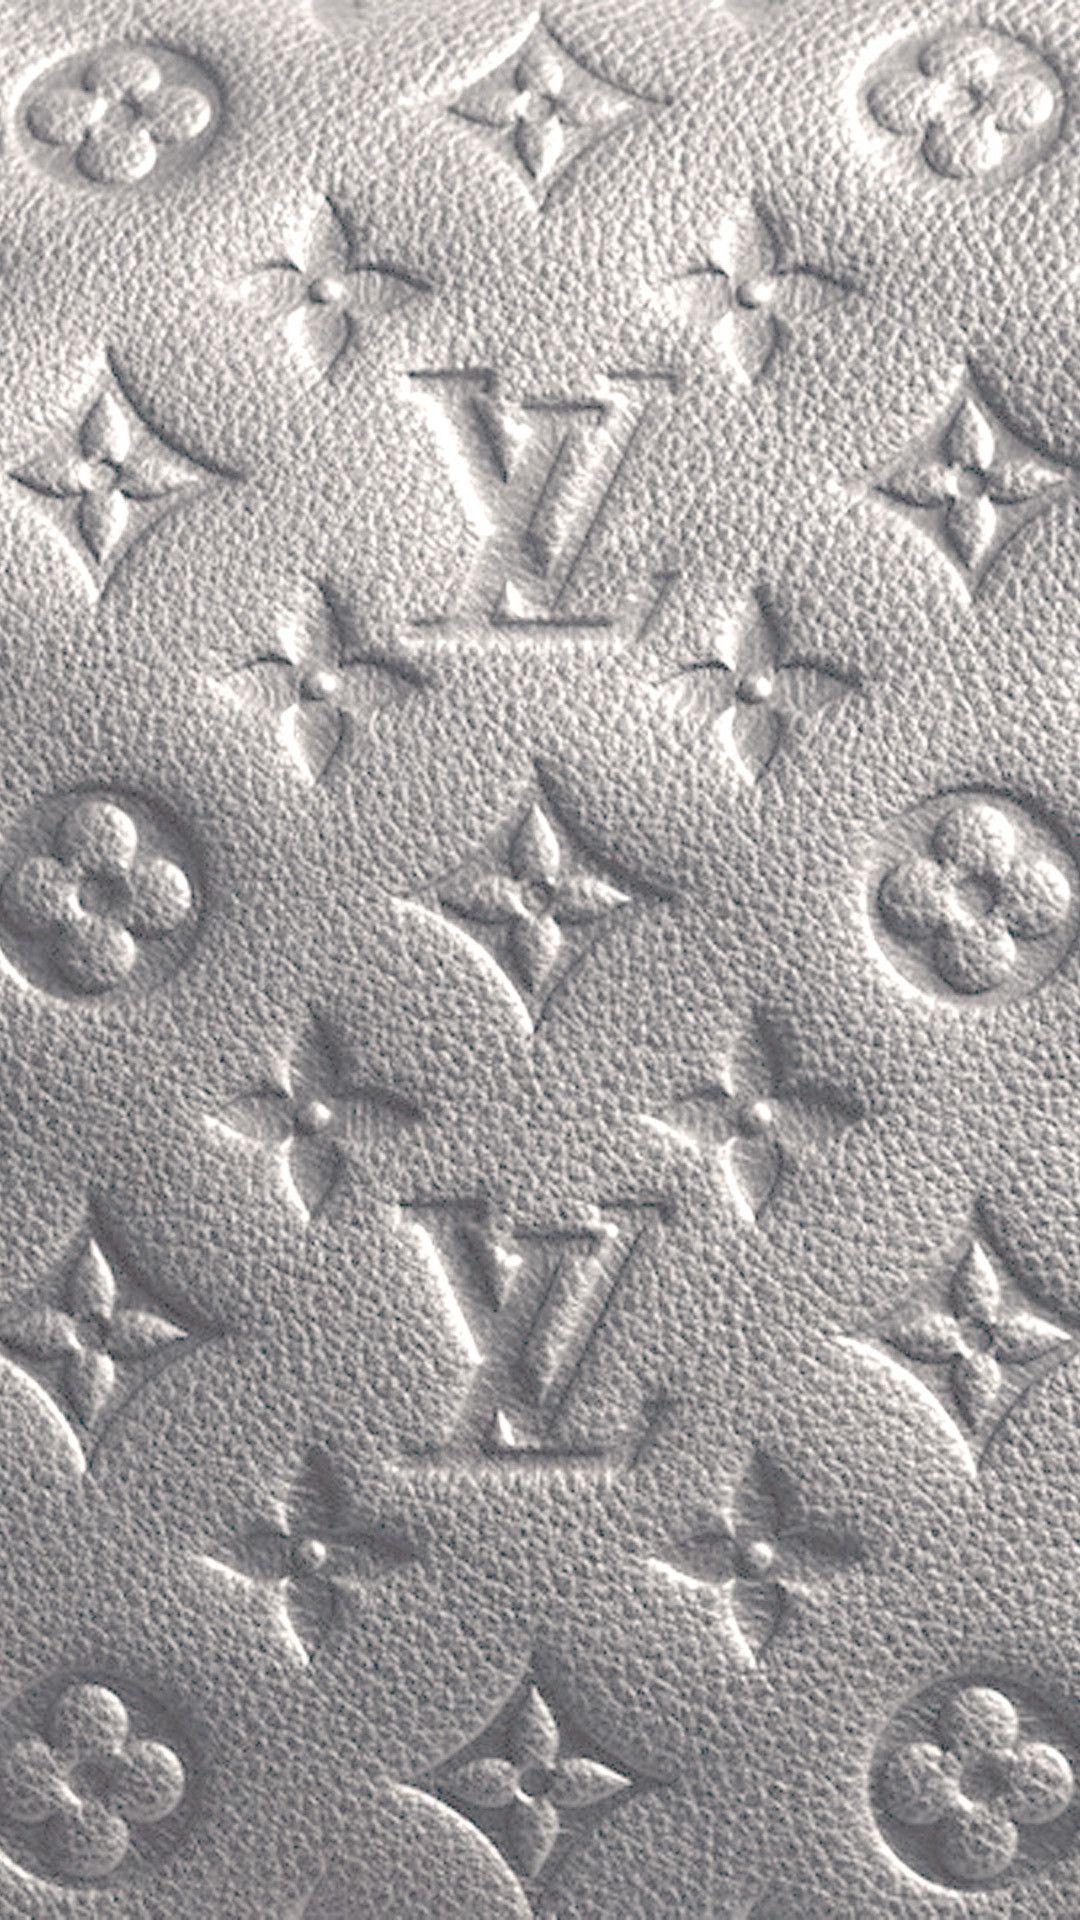 Louis Vuitton iPhone Wallpapers   Top Louis Vuitton iPhone 1080x1920